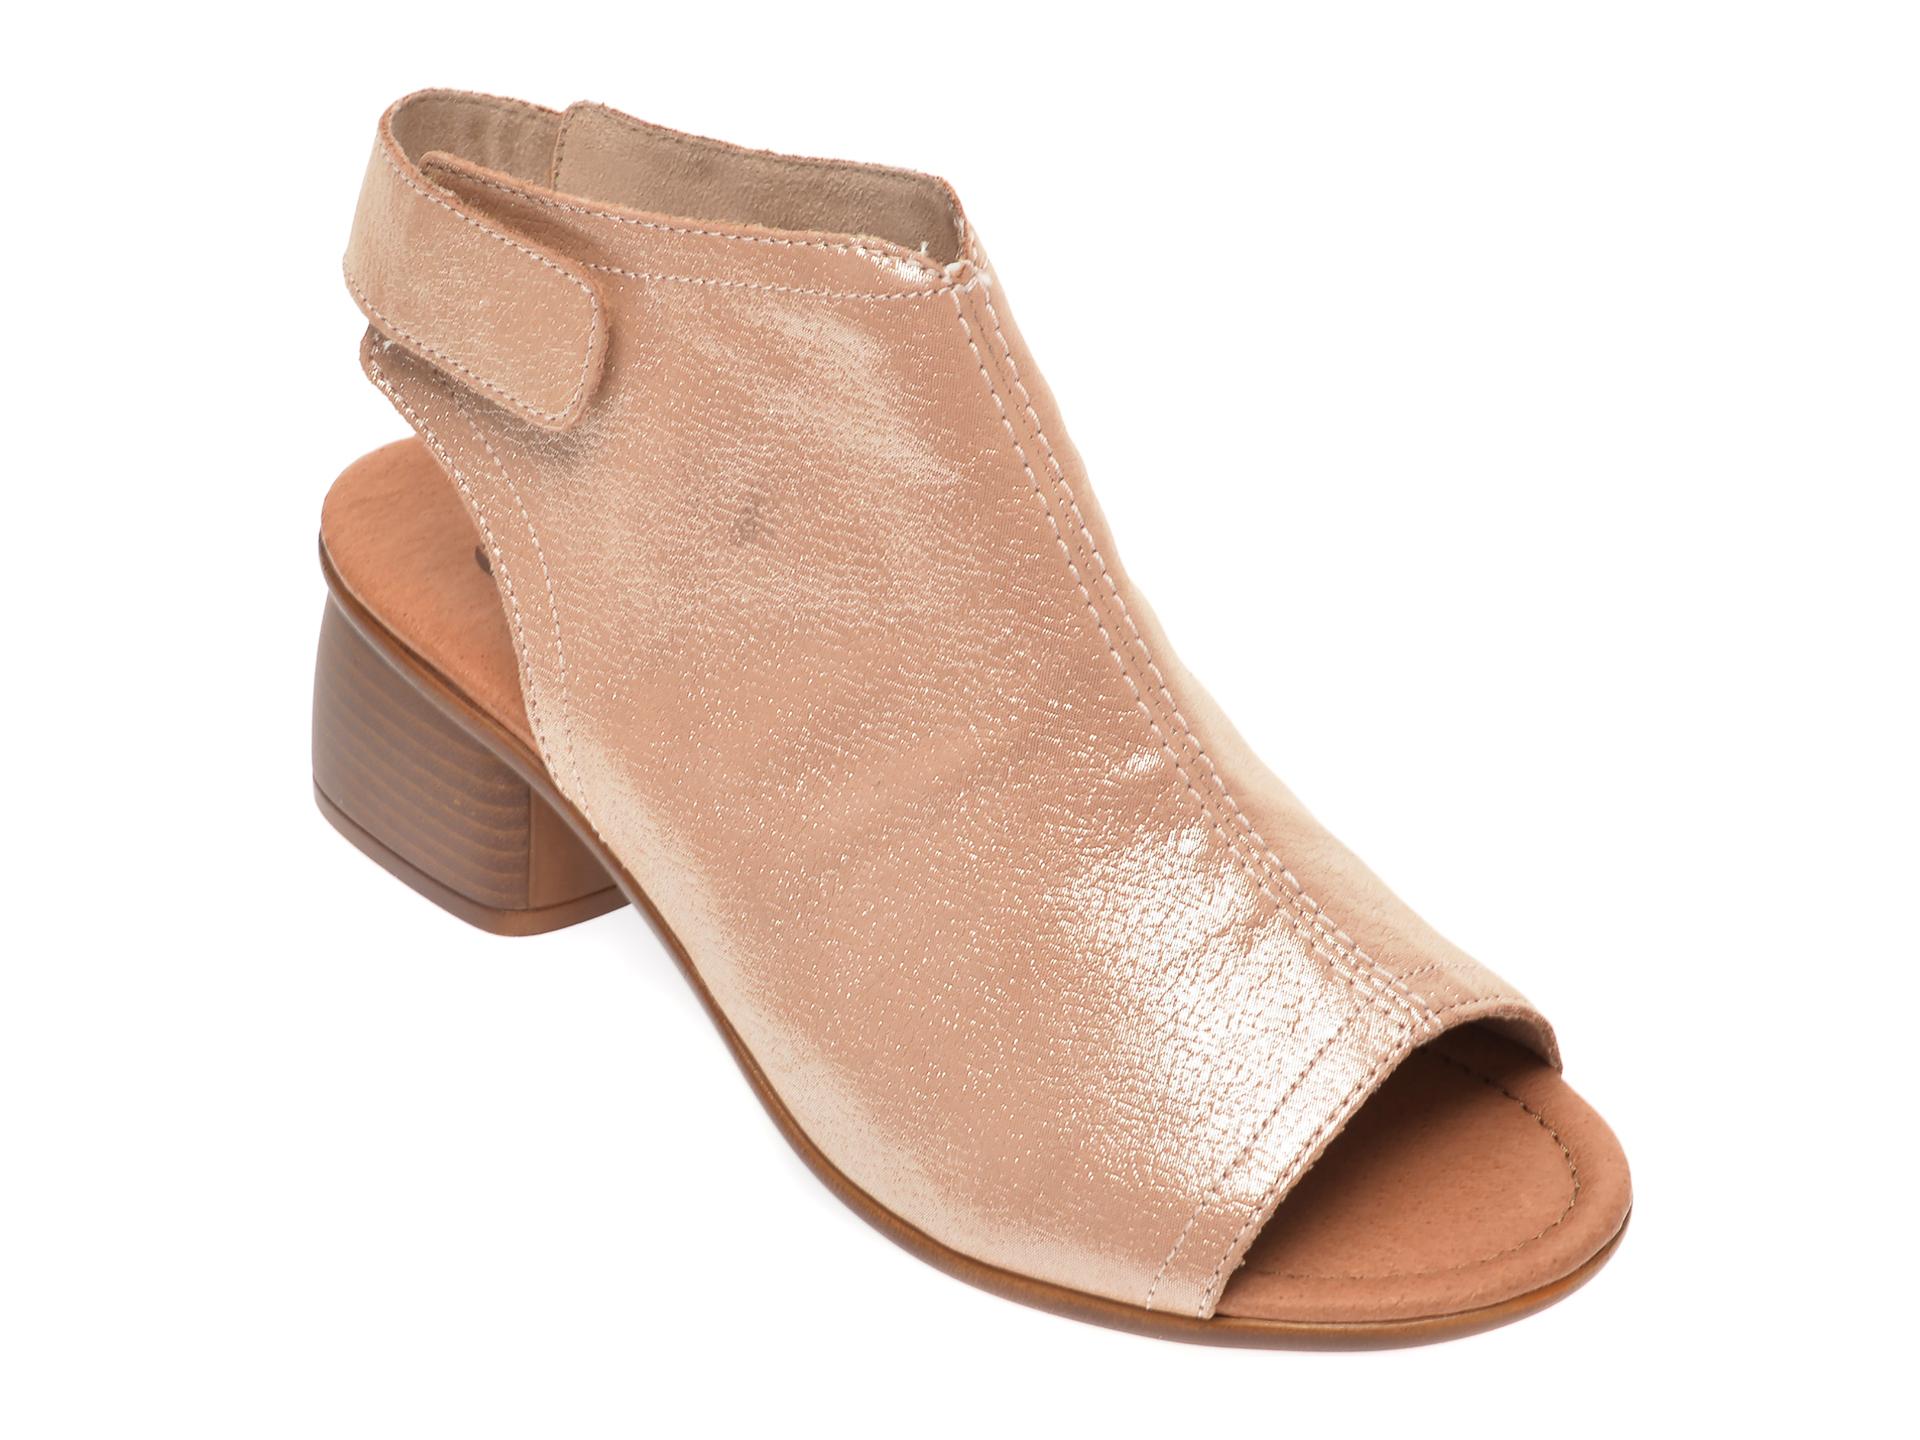 Sandale REMONTE aurii, R8770, din piele naturala